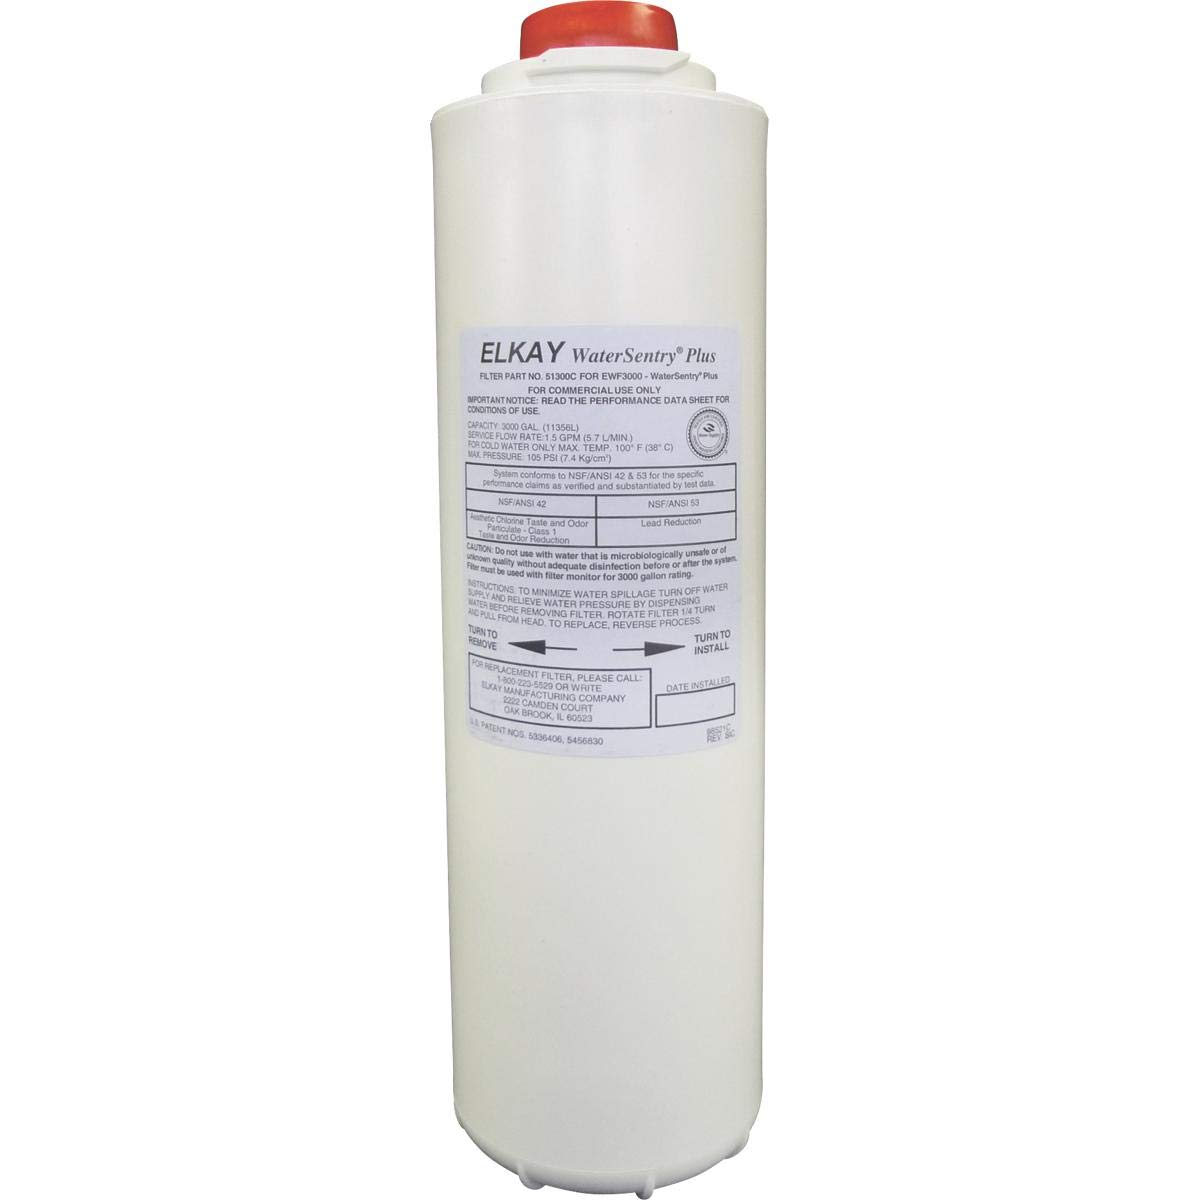 Elkay 51300C_2PK WaterSentry Plus Replacement Filter (Bottle Fillers), 2-Pack